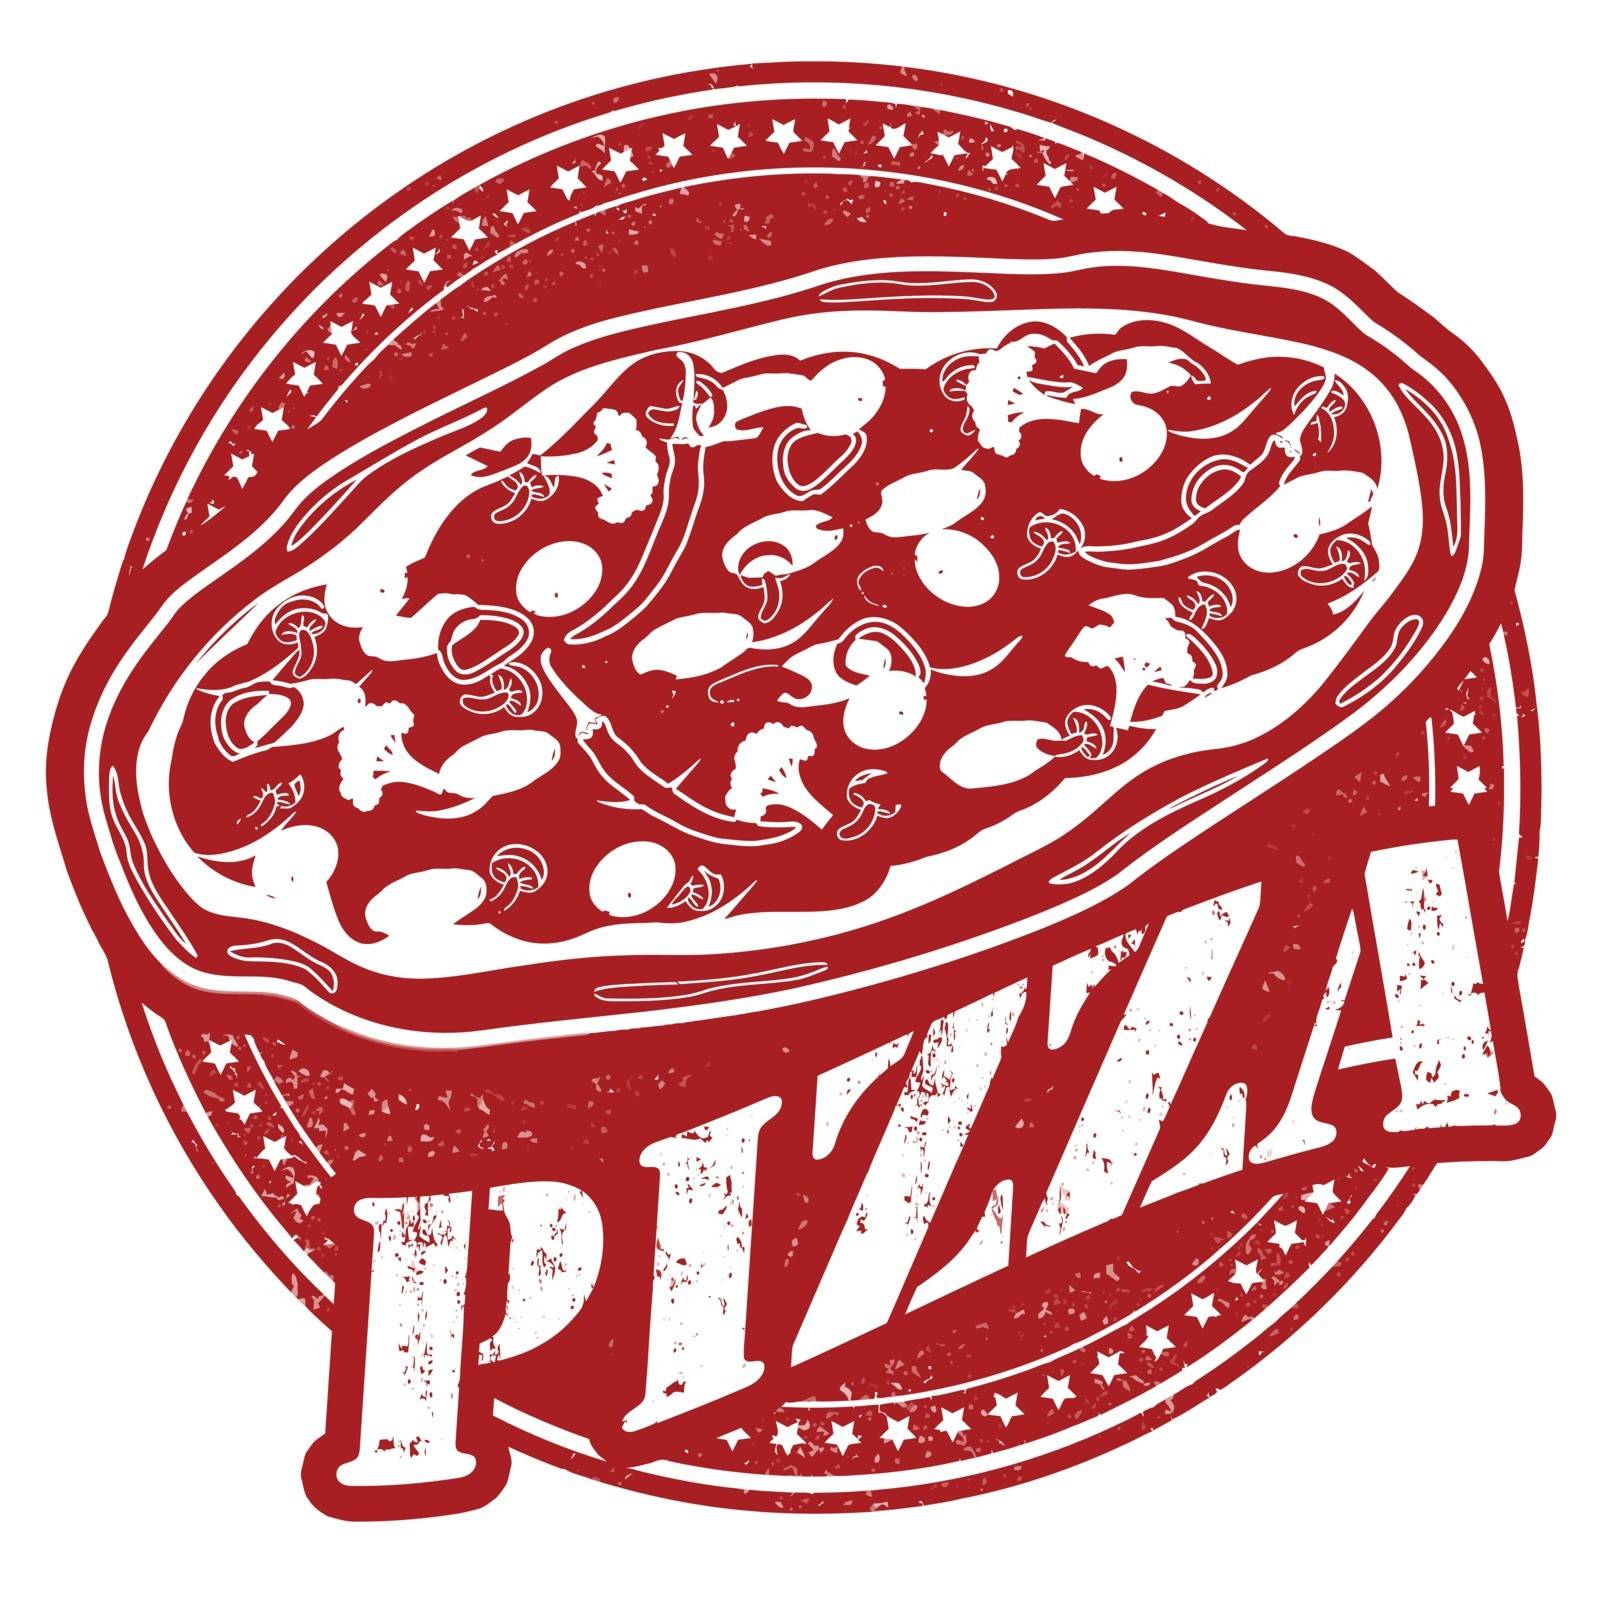 Pizza vintage sign on white background, vector illustration